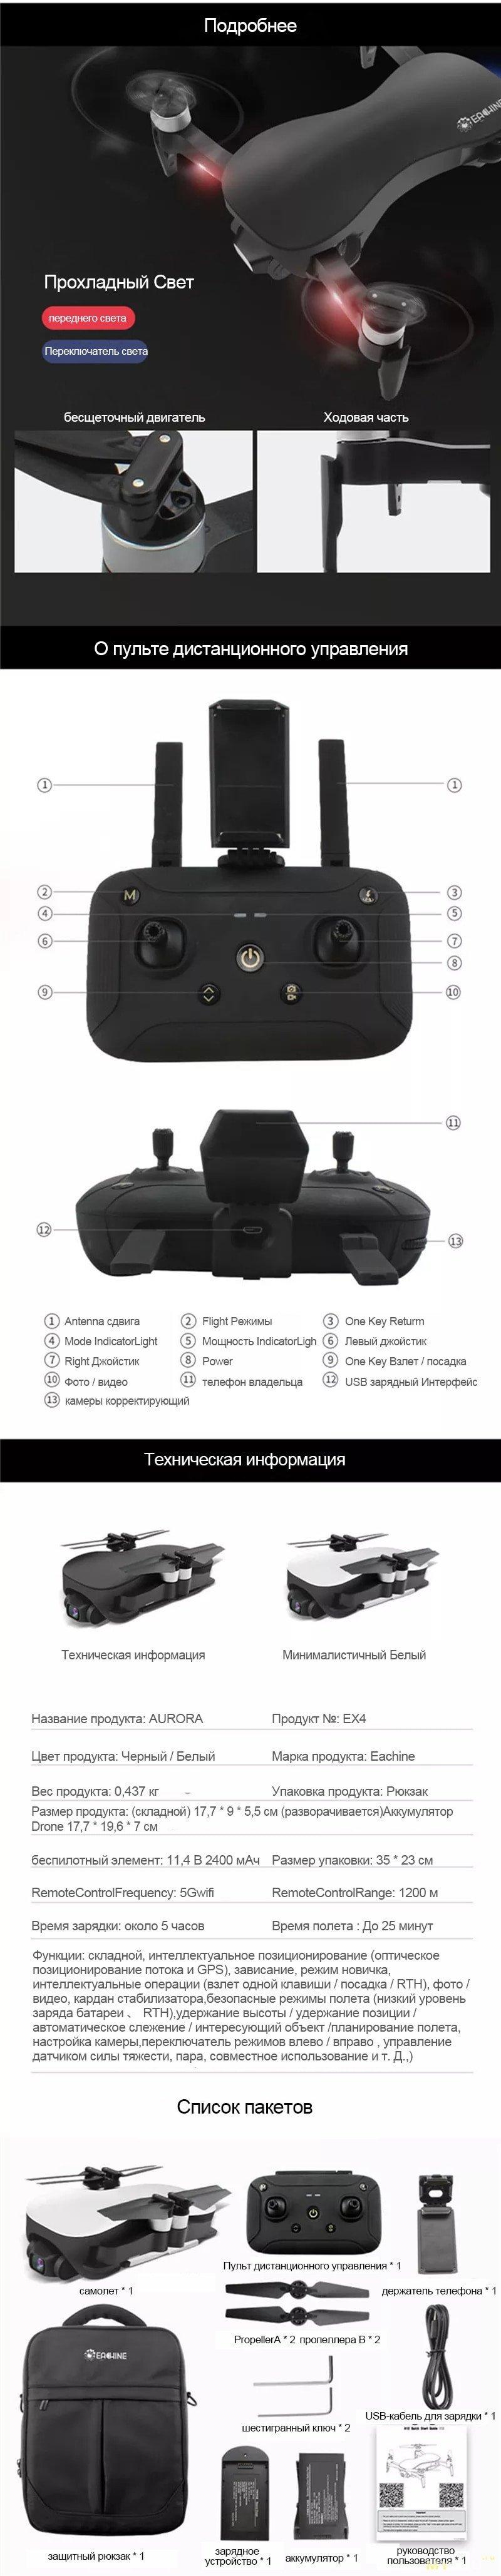 Квадрокоптер  Eachine EX4 за 1.31(RU склад)